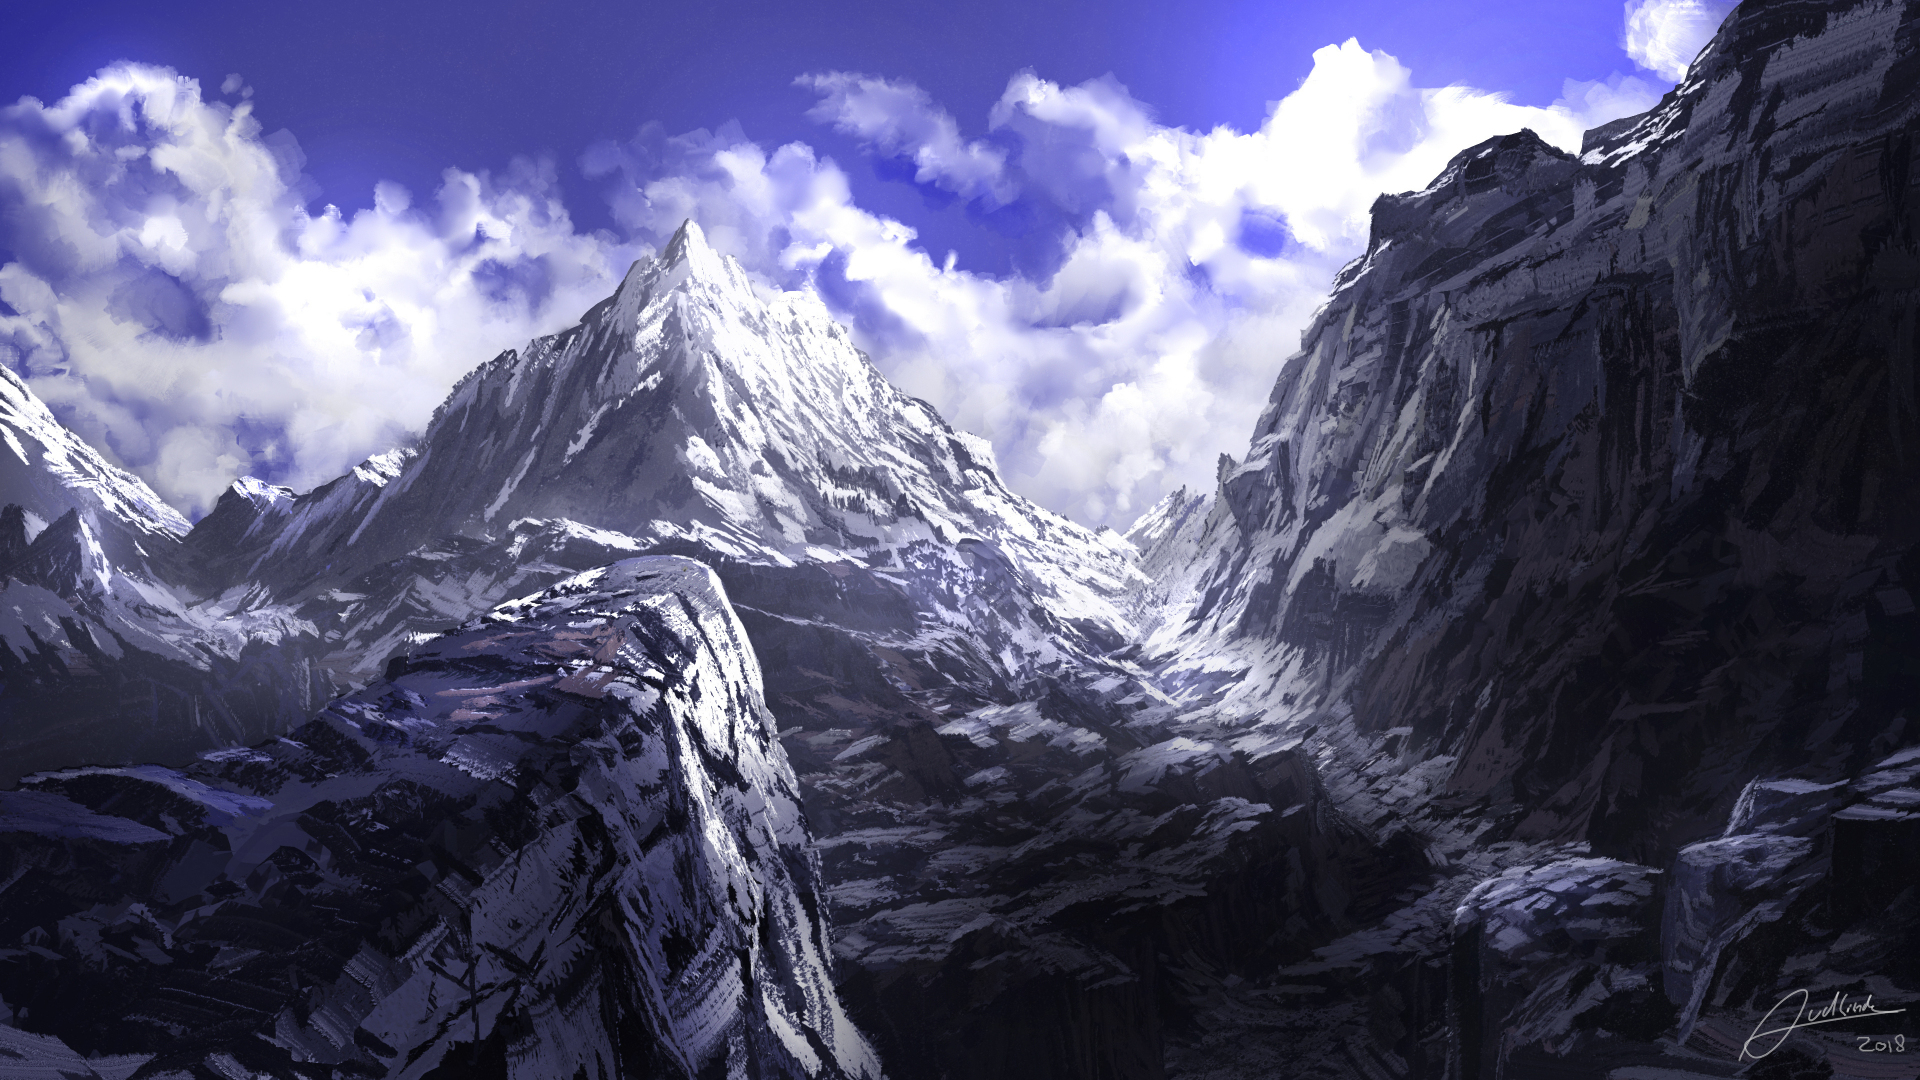 Download 1920x1080 Wallpaper Anime Mountains Summit Art Full